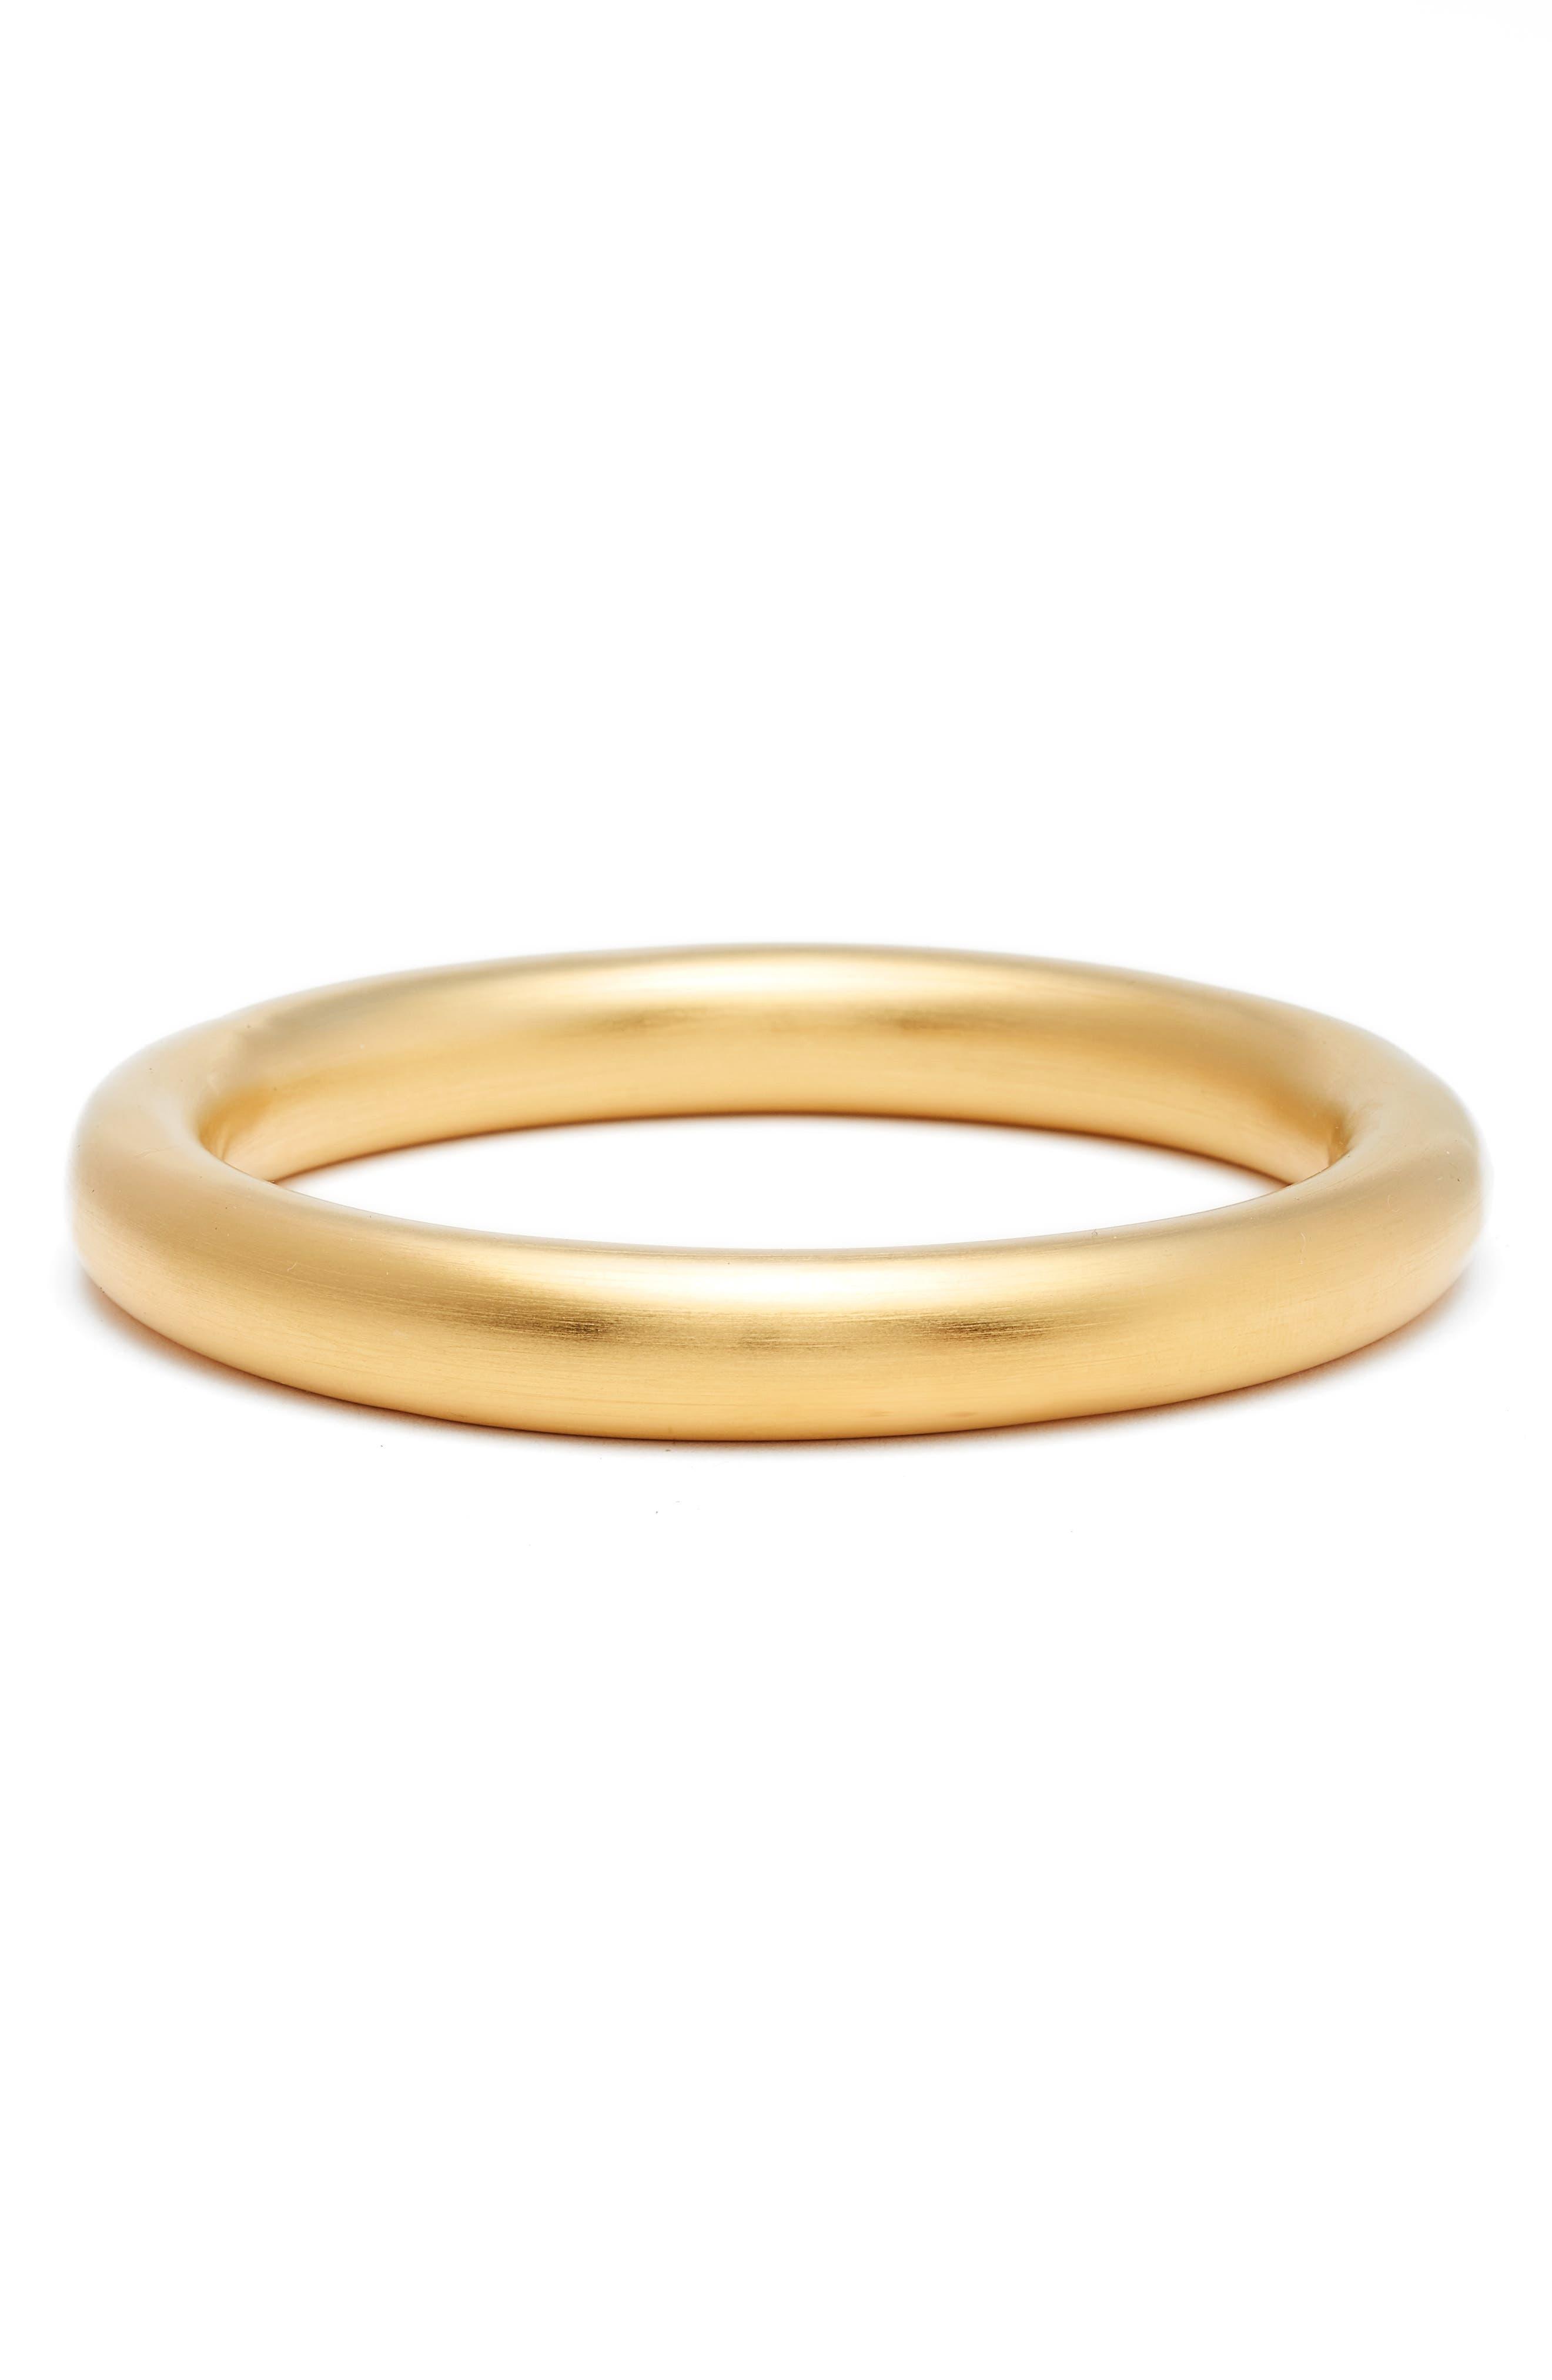 Ipanema Tubular Bangle Bracelet,                             Main thumbnail 1, color,                             GOLD